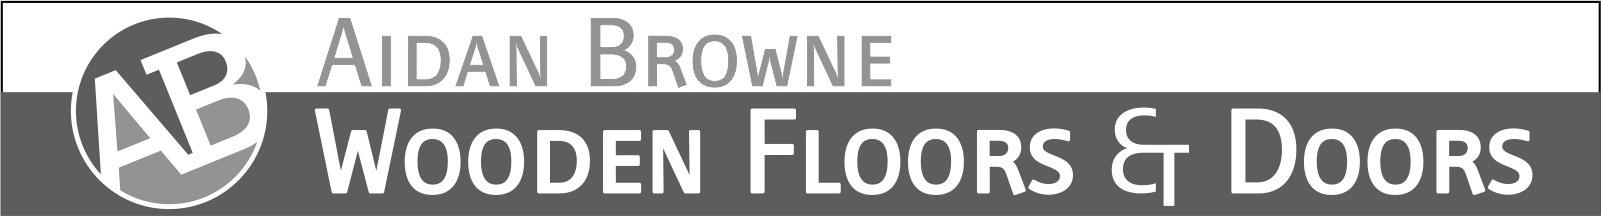 A. Browne Wooden Floors & Doors Logo